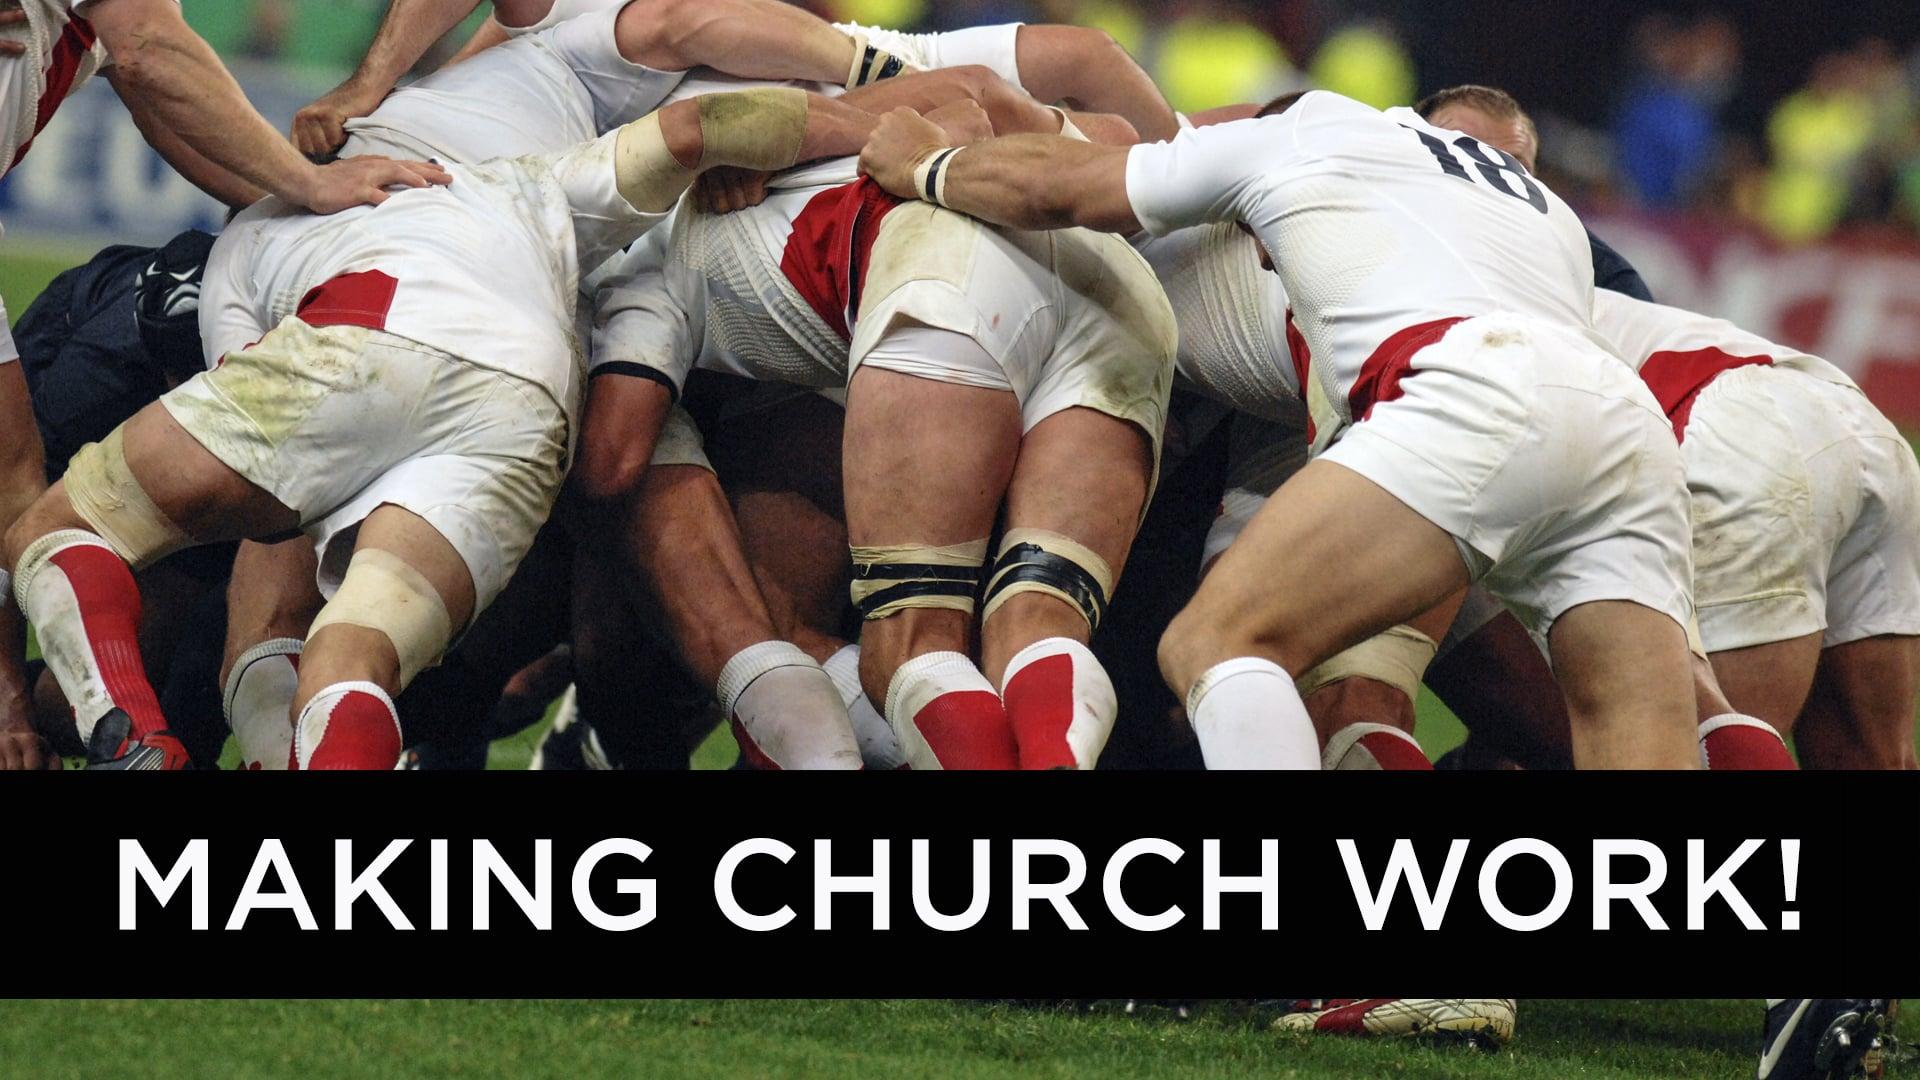 Making Church Work - Part 2